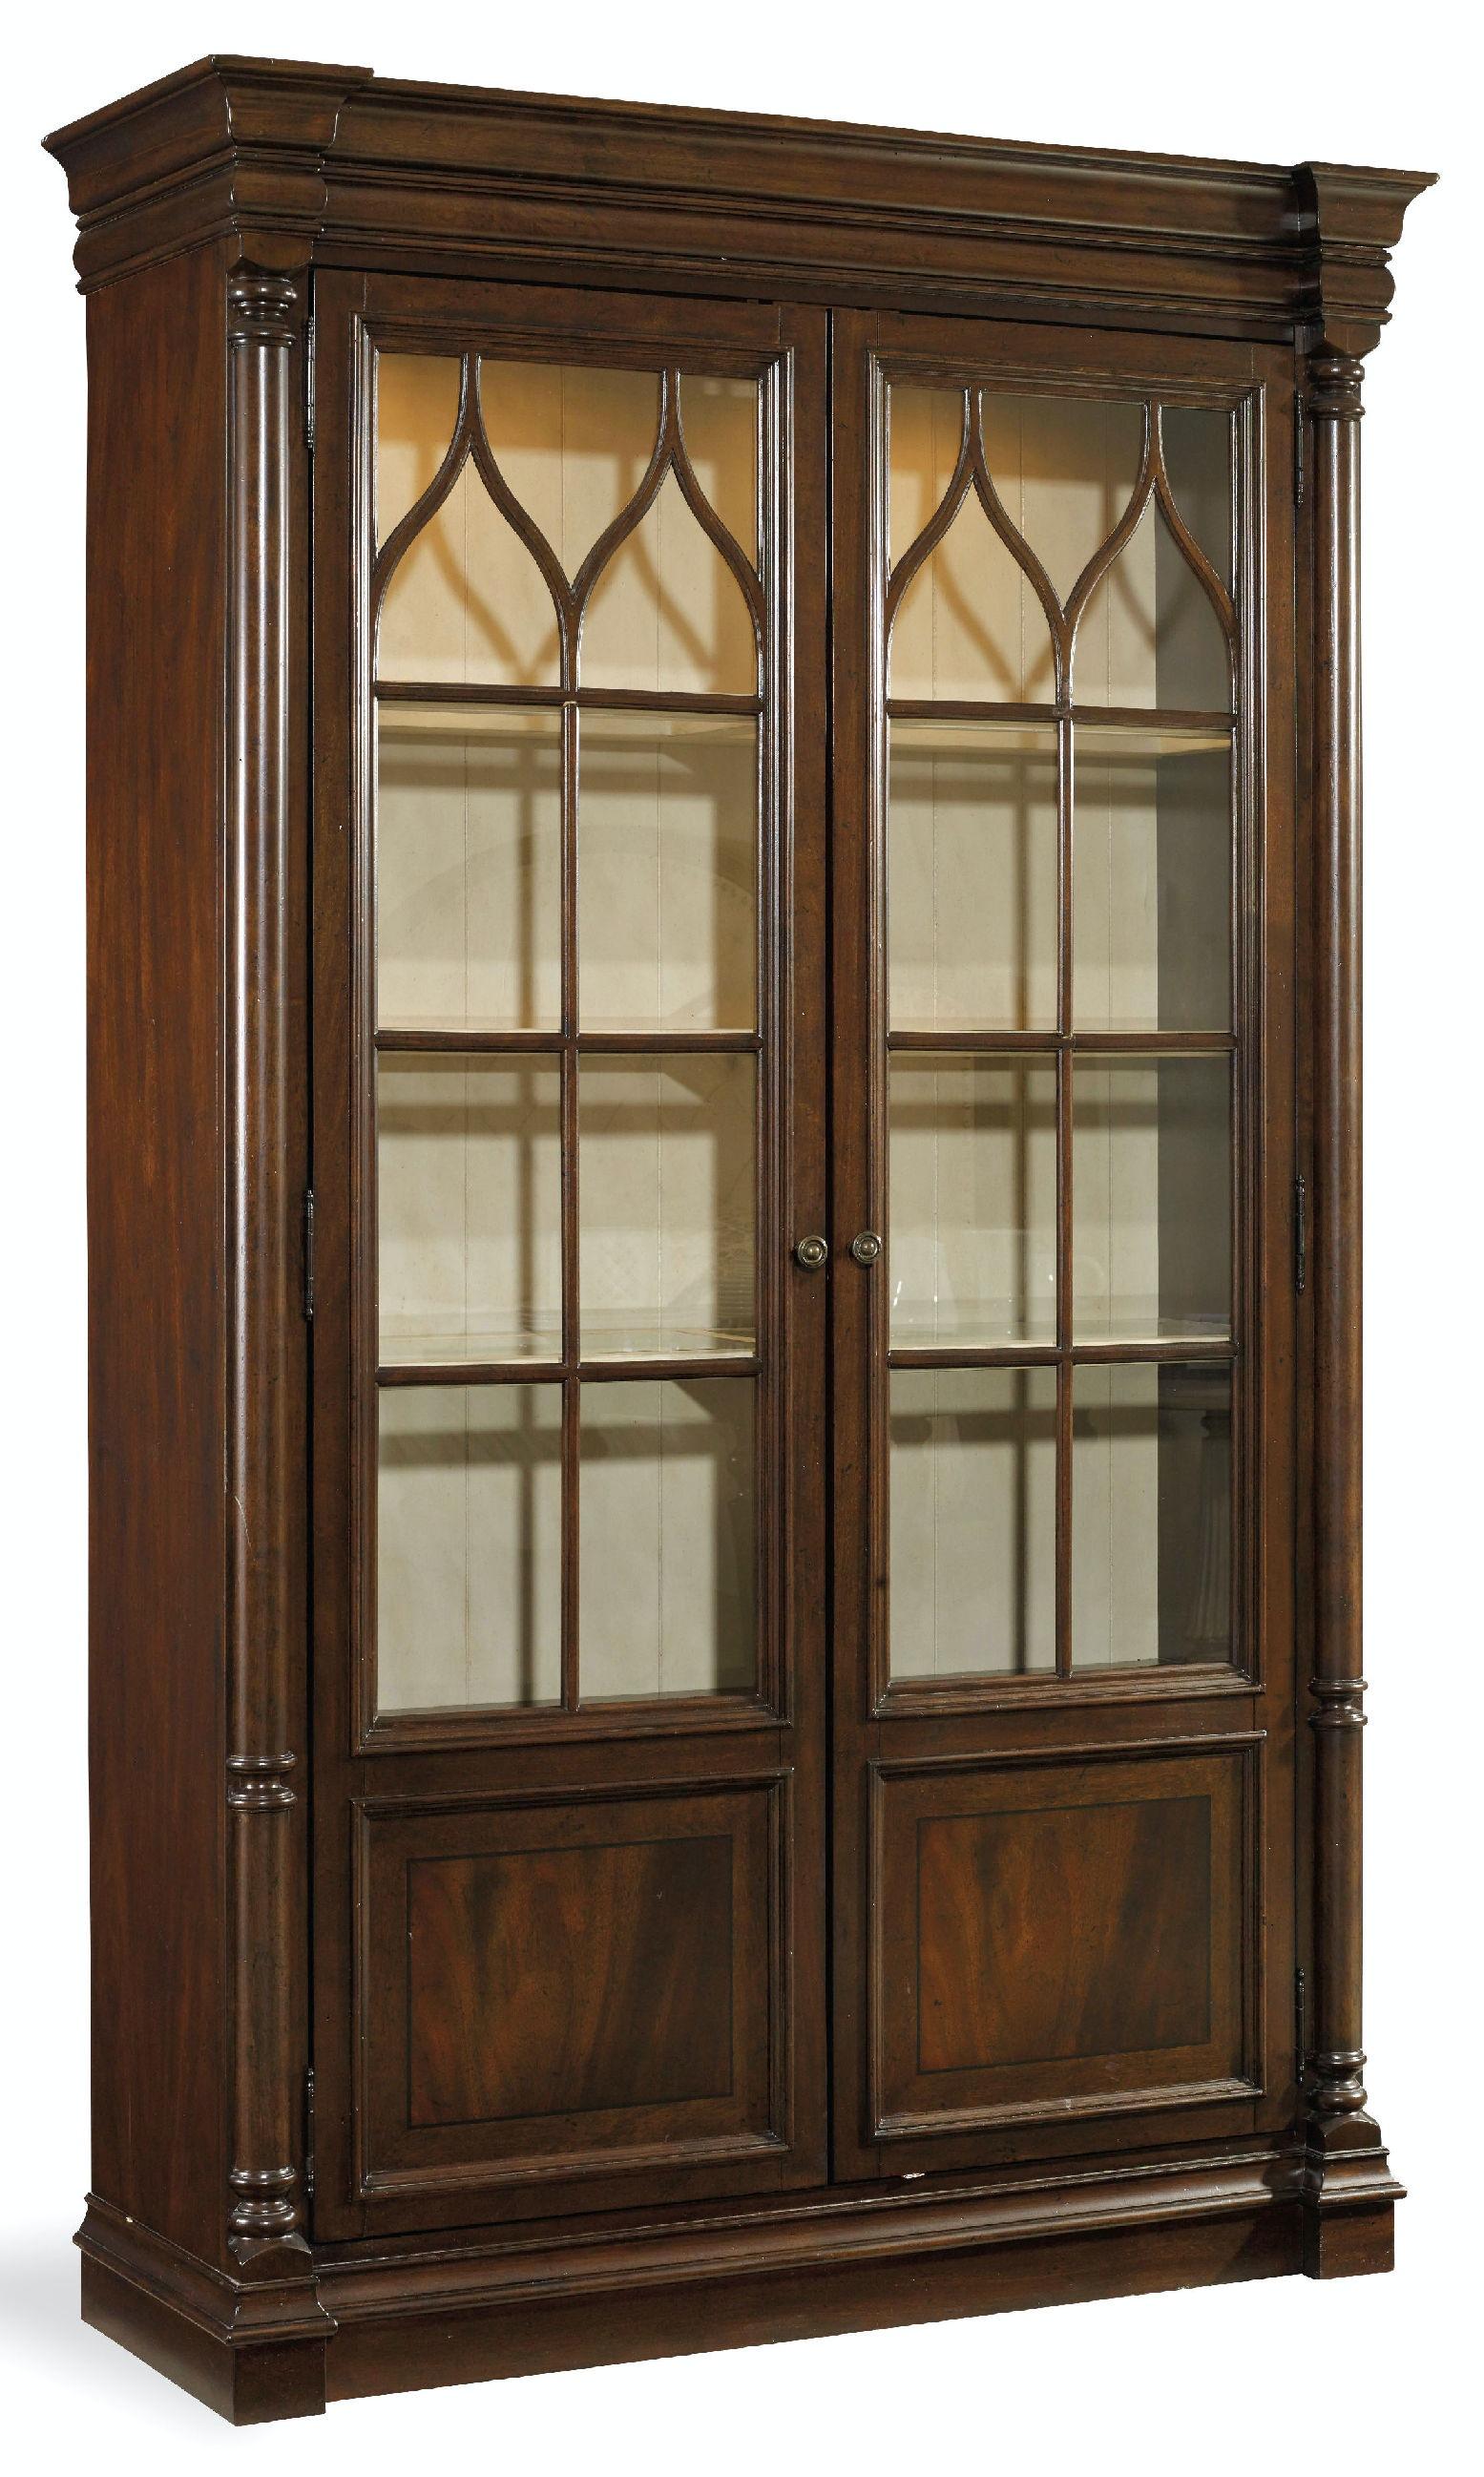 Charming Hooker Furniture Leesburg Display Cabinet 5381 75906